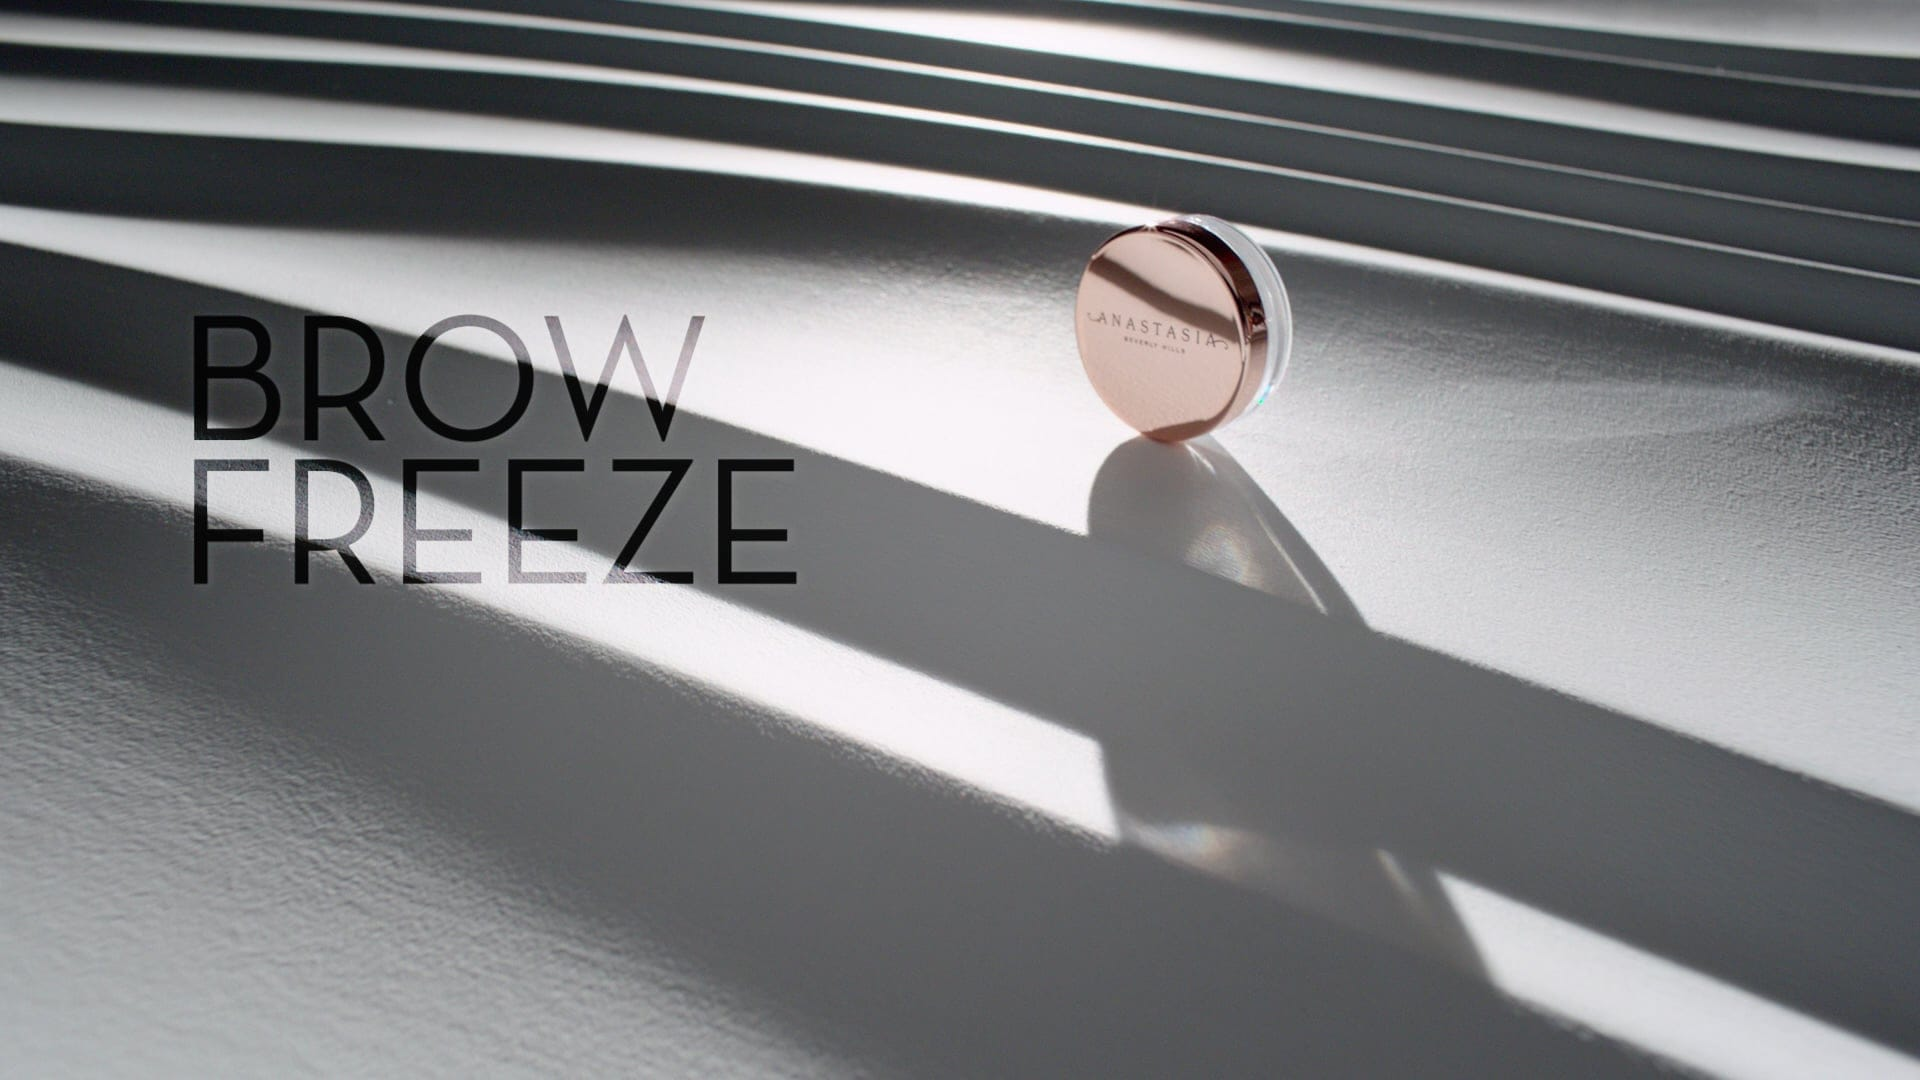 Brow Freeze Campaign